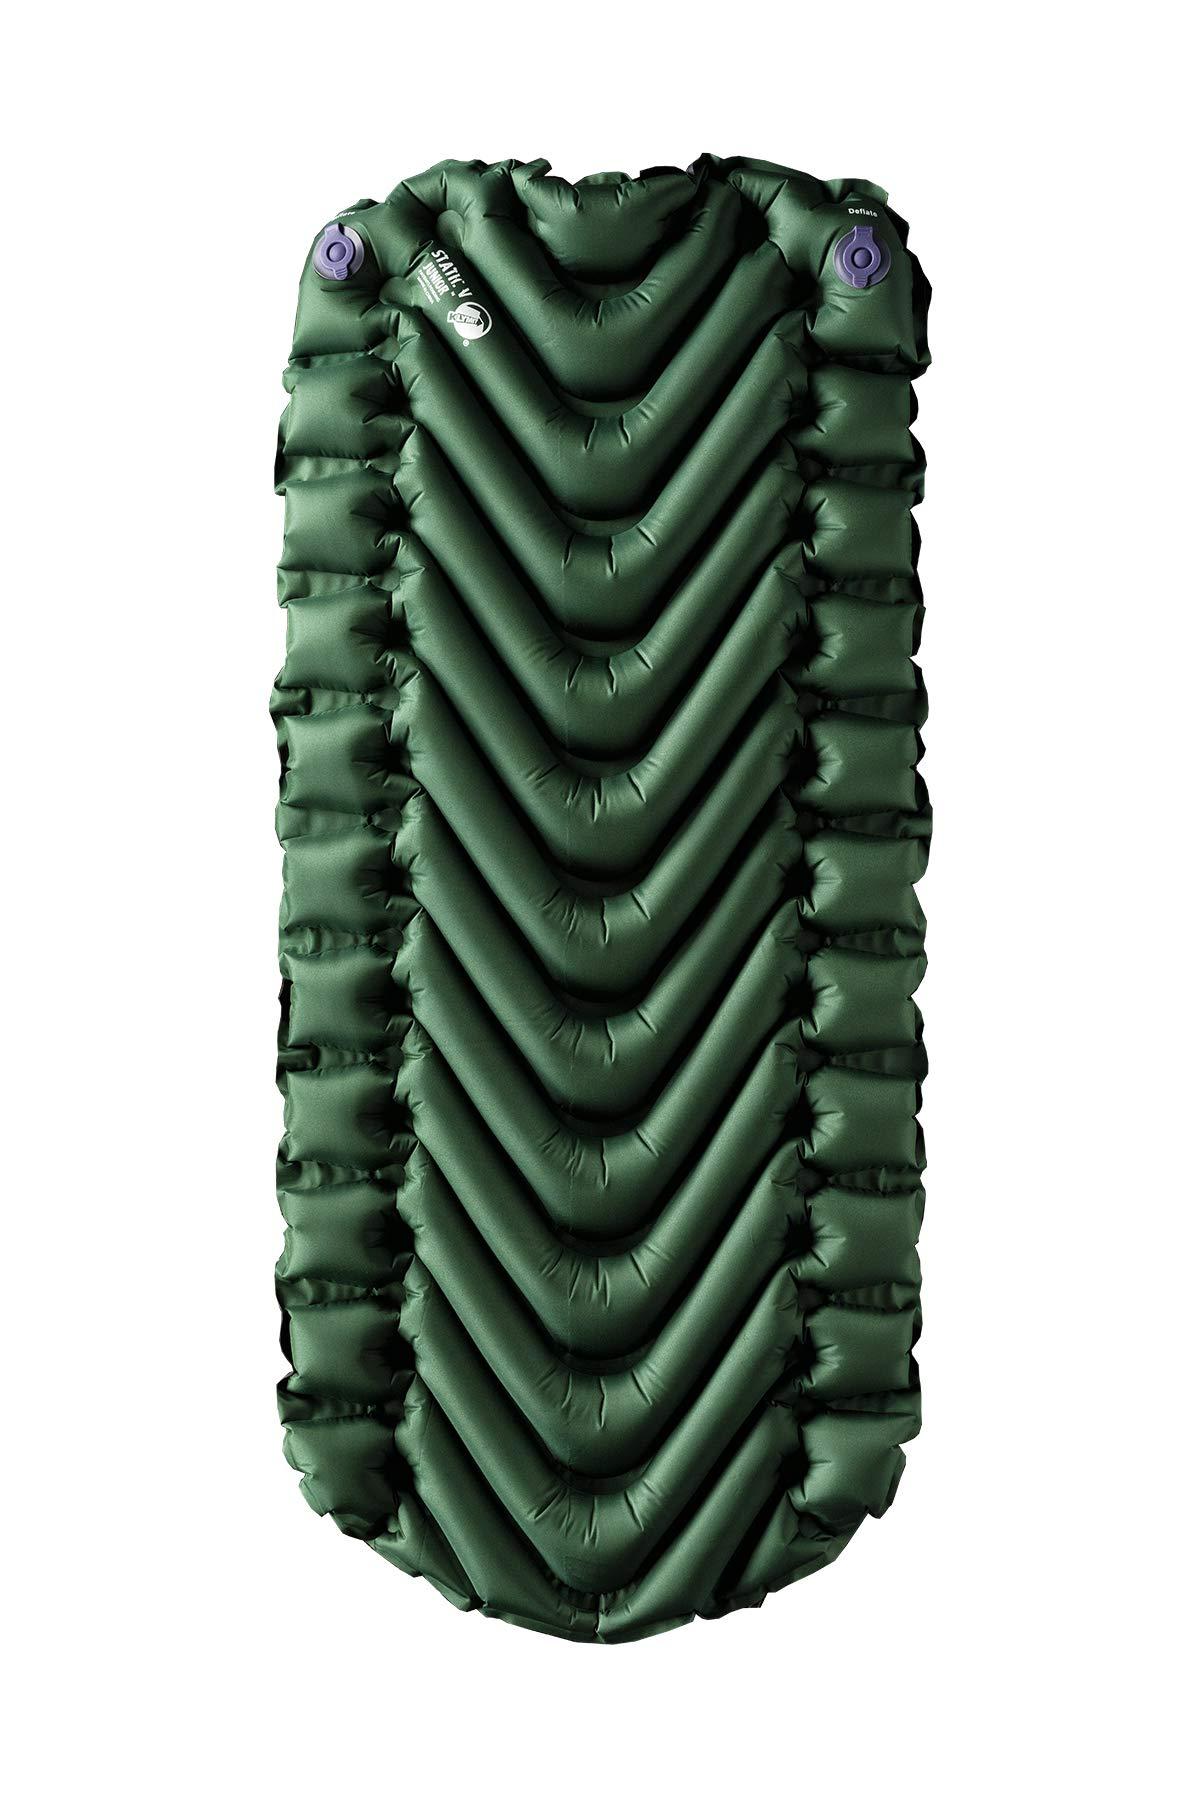 Klymit Static V Junior Sleeping Pad, Green/Char Black by Klymit